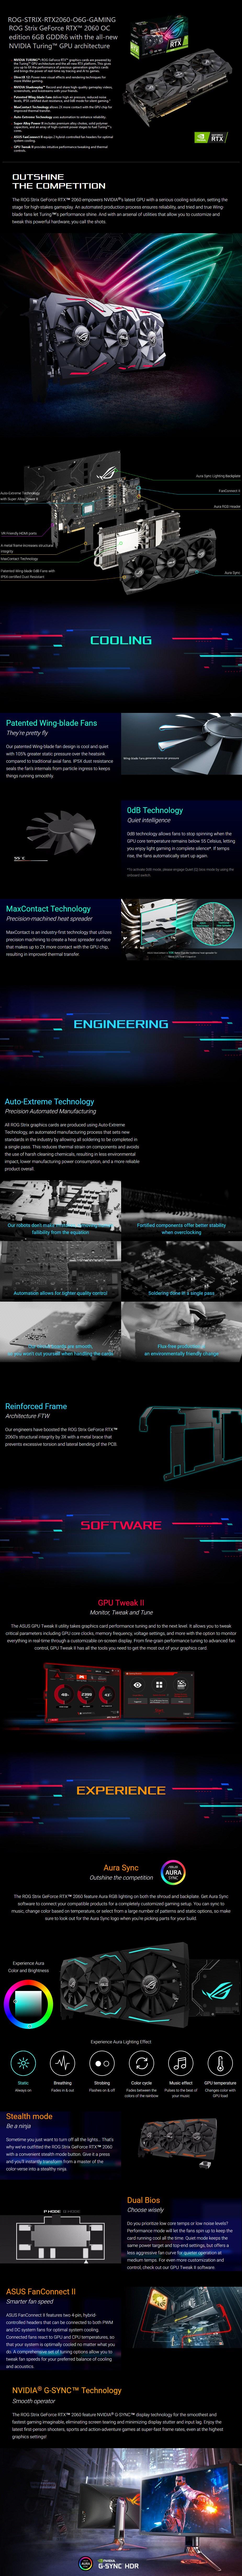 ASUS GeForce RTX 2060 ROG Strix OC 6GB Video Card - Desktop Overview 1